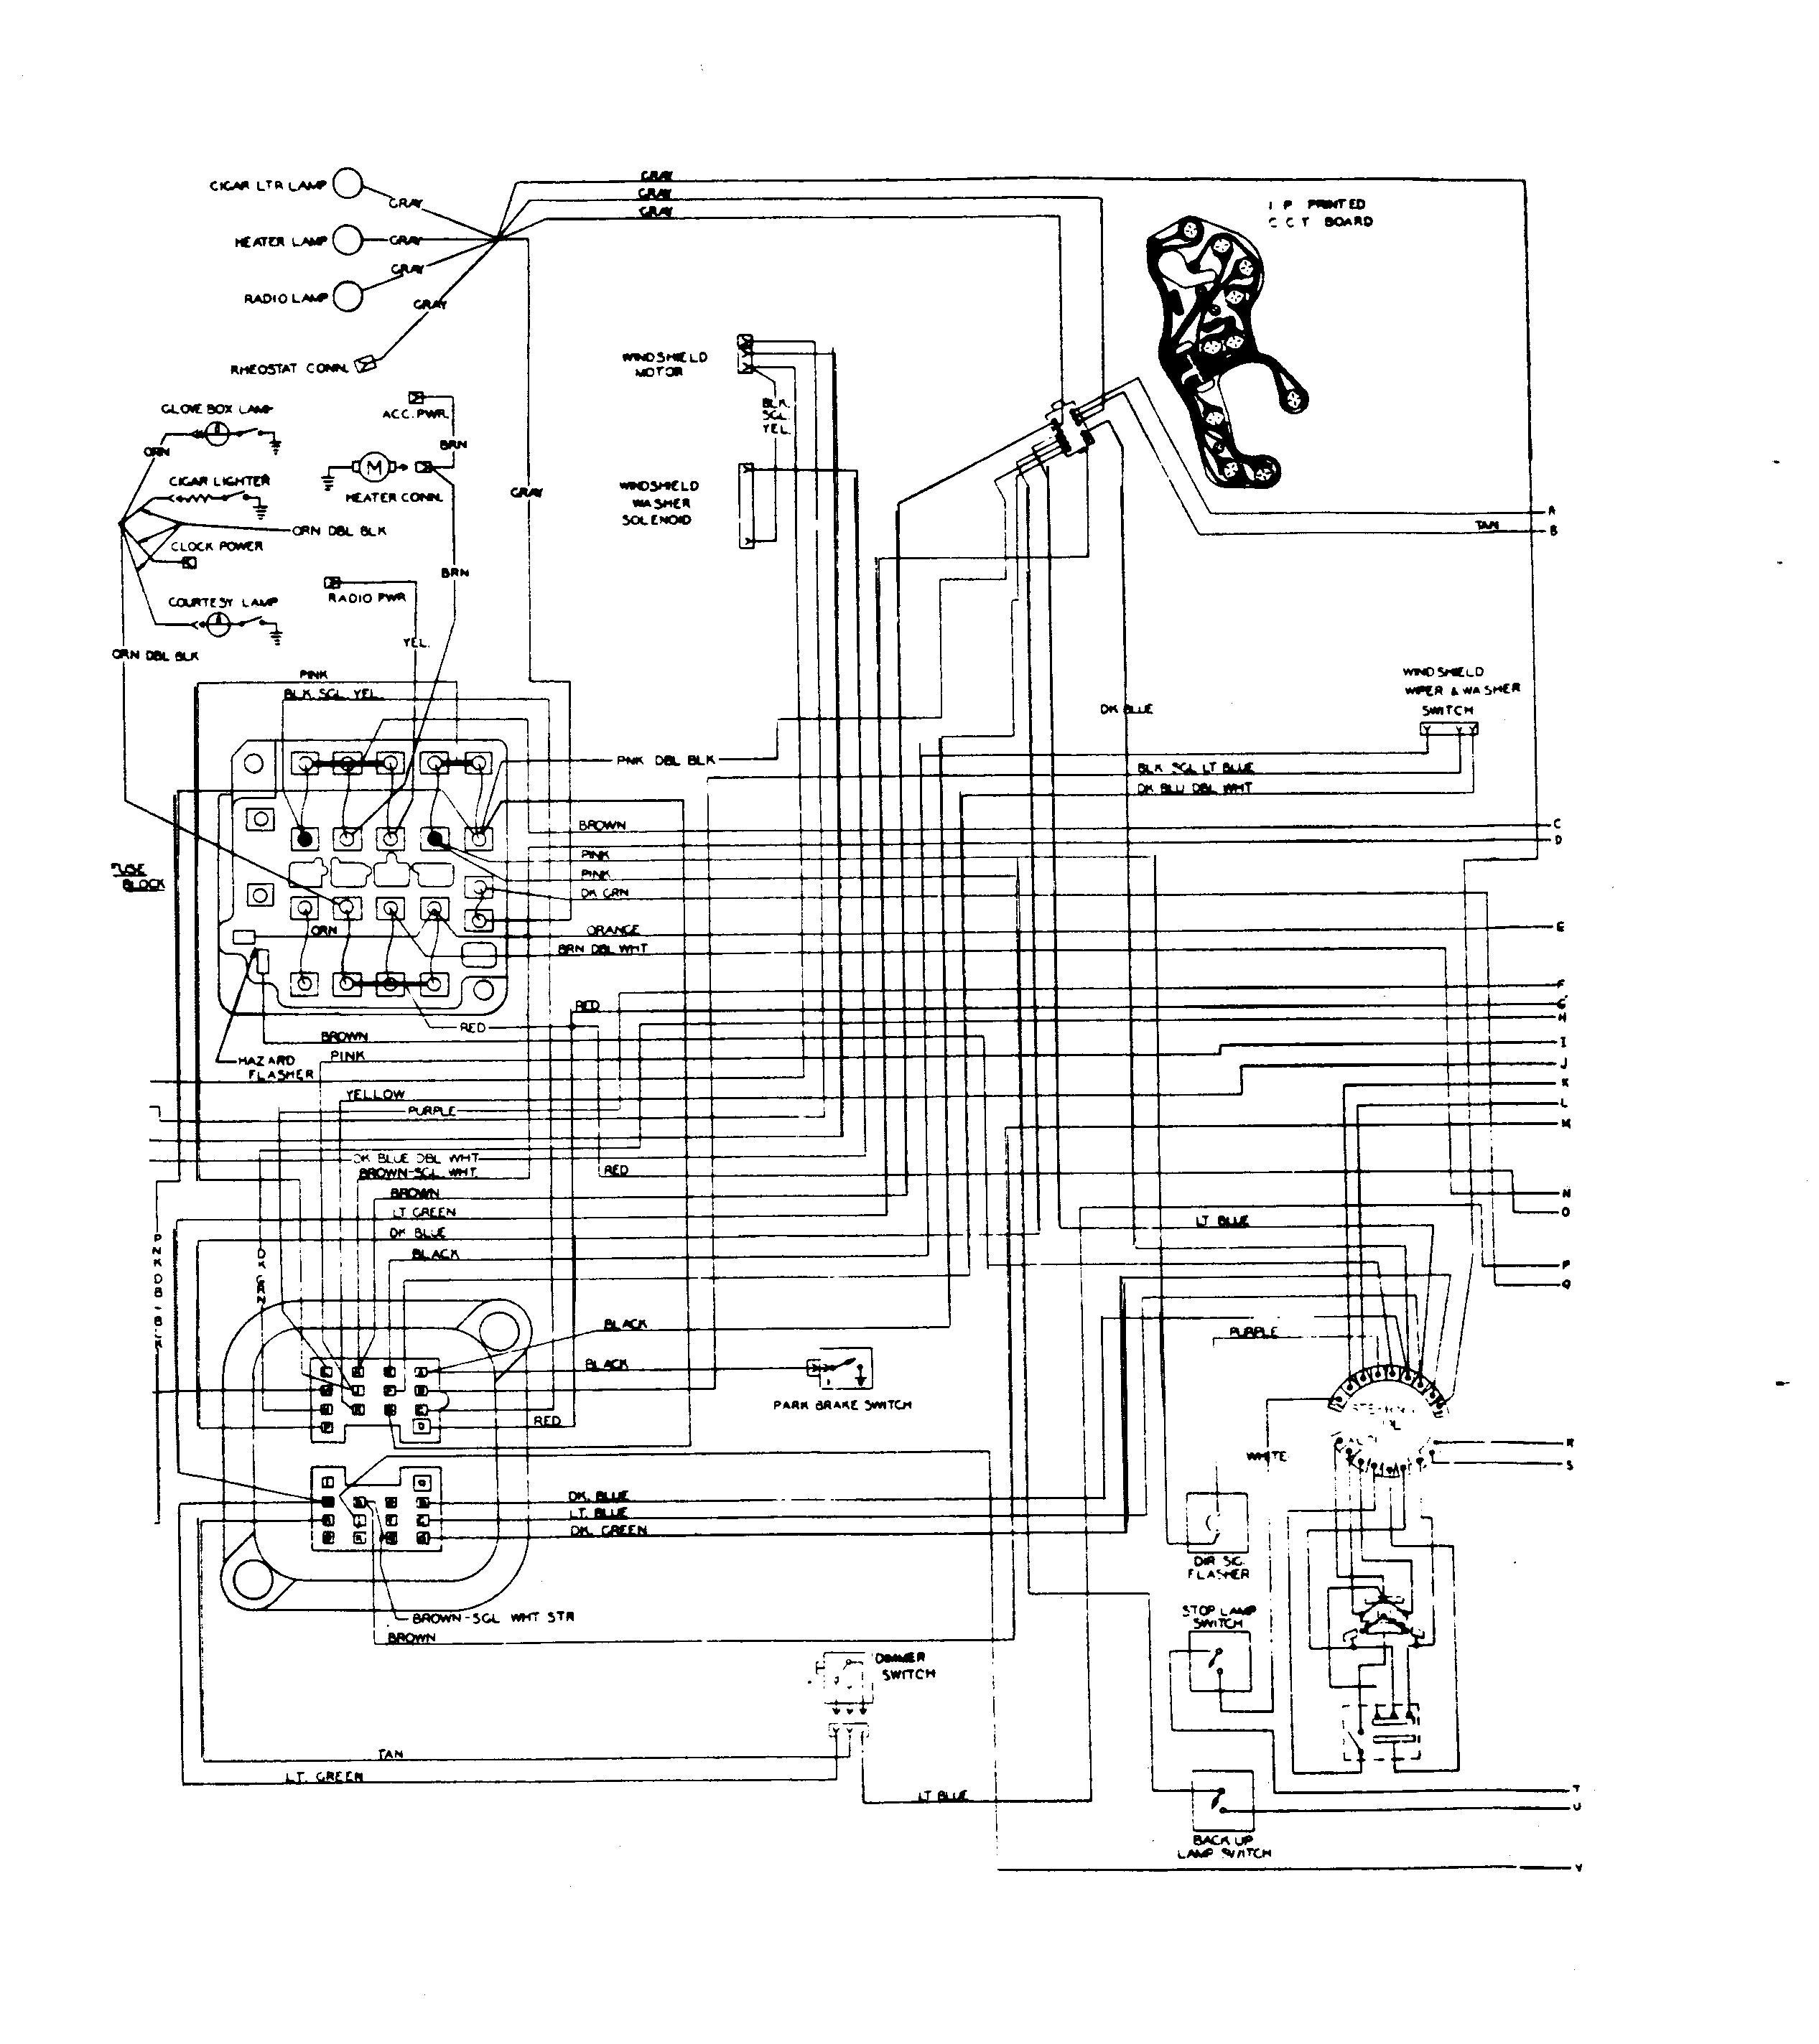 pontiac gto wiring diagram image wiring 1967 pontiac gto wiring diagram 1967 auto wiring diagram schematic on 1967 pontiac gto wiring diagram